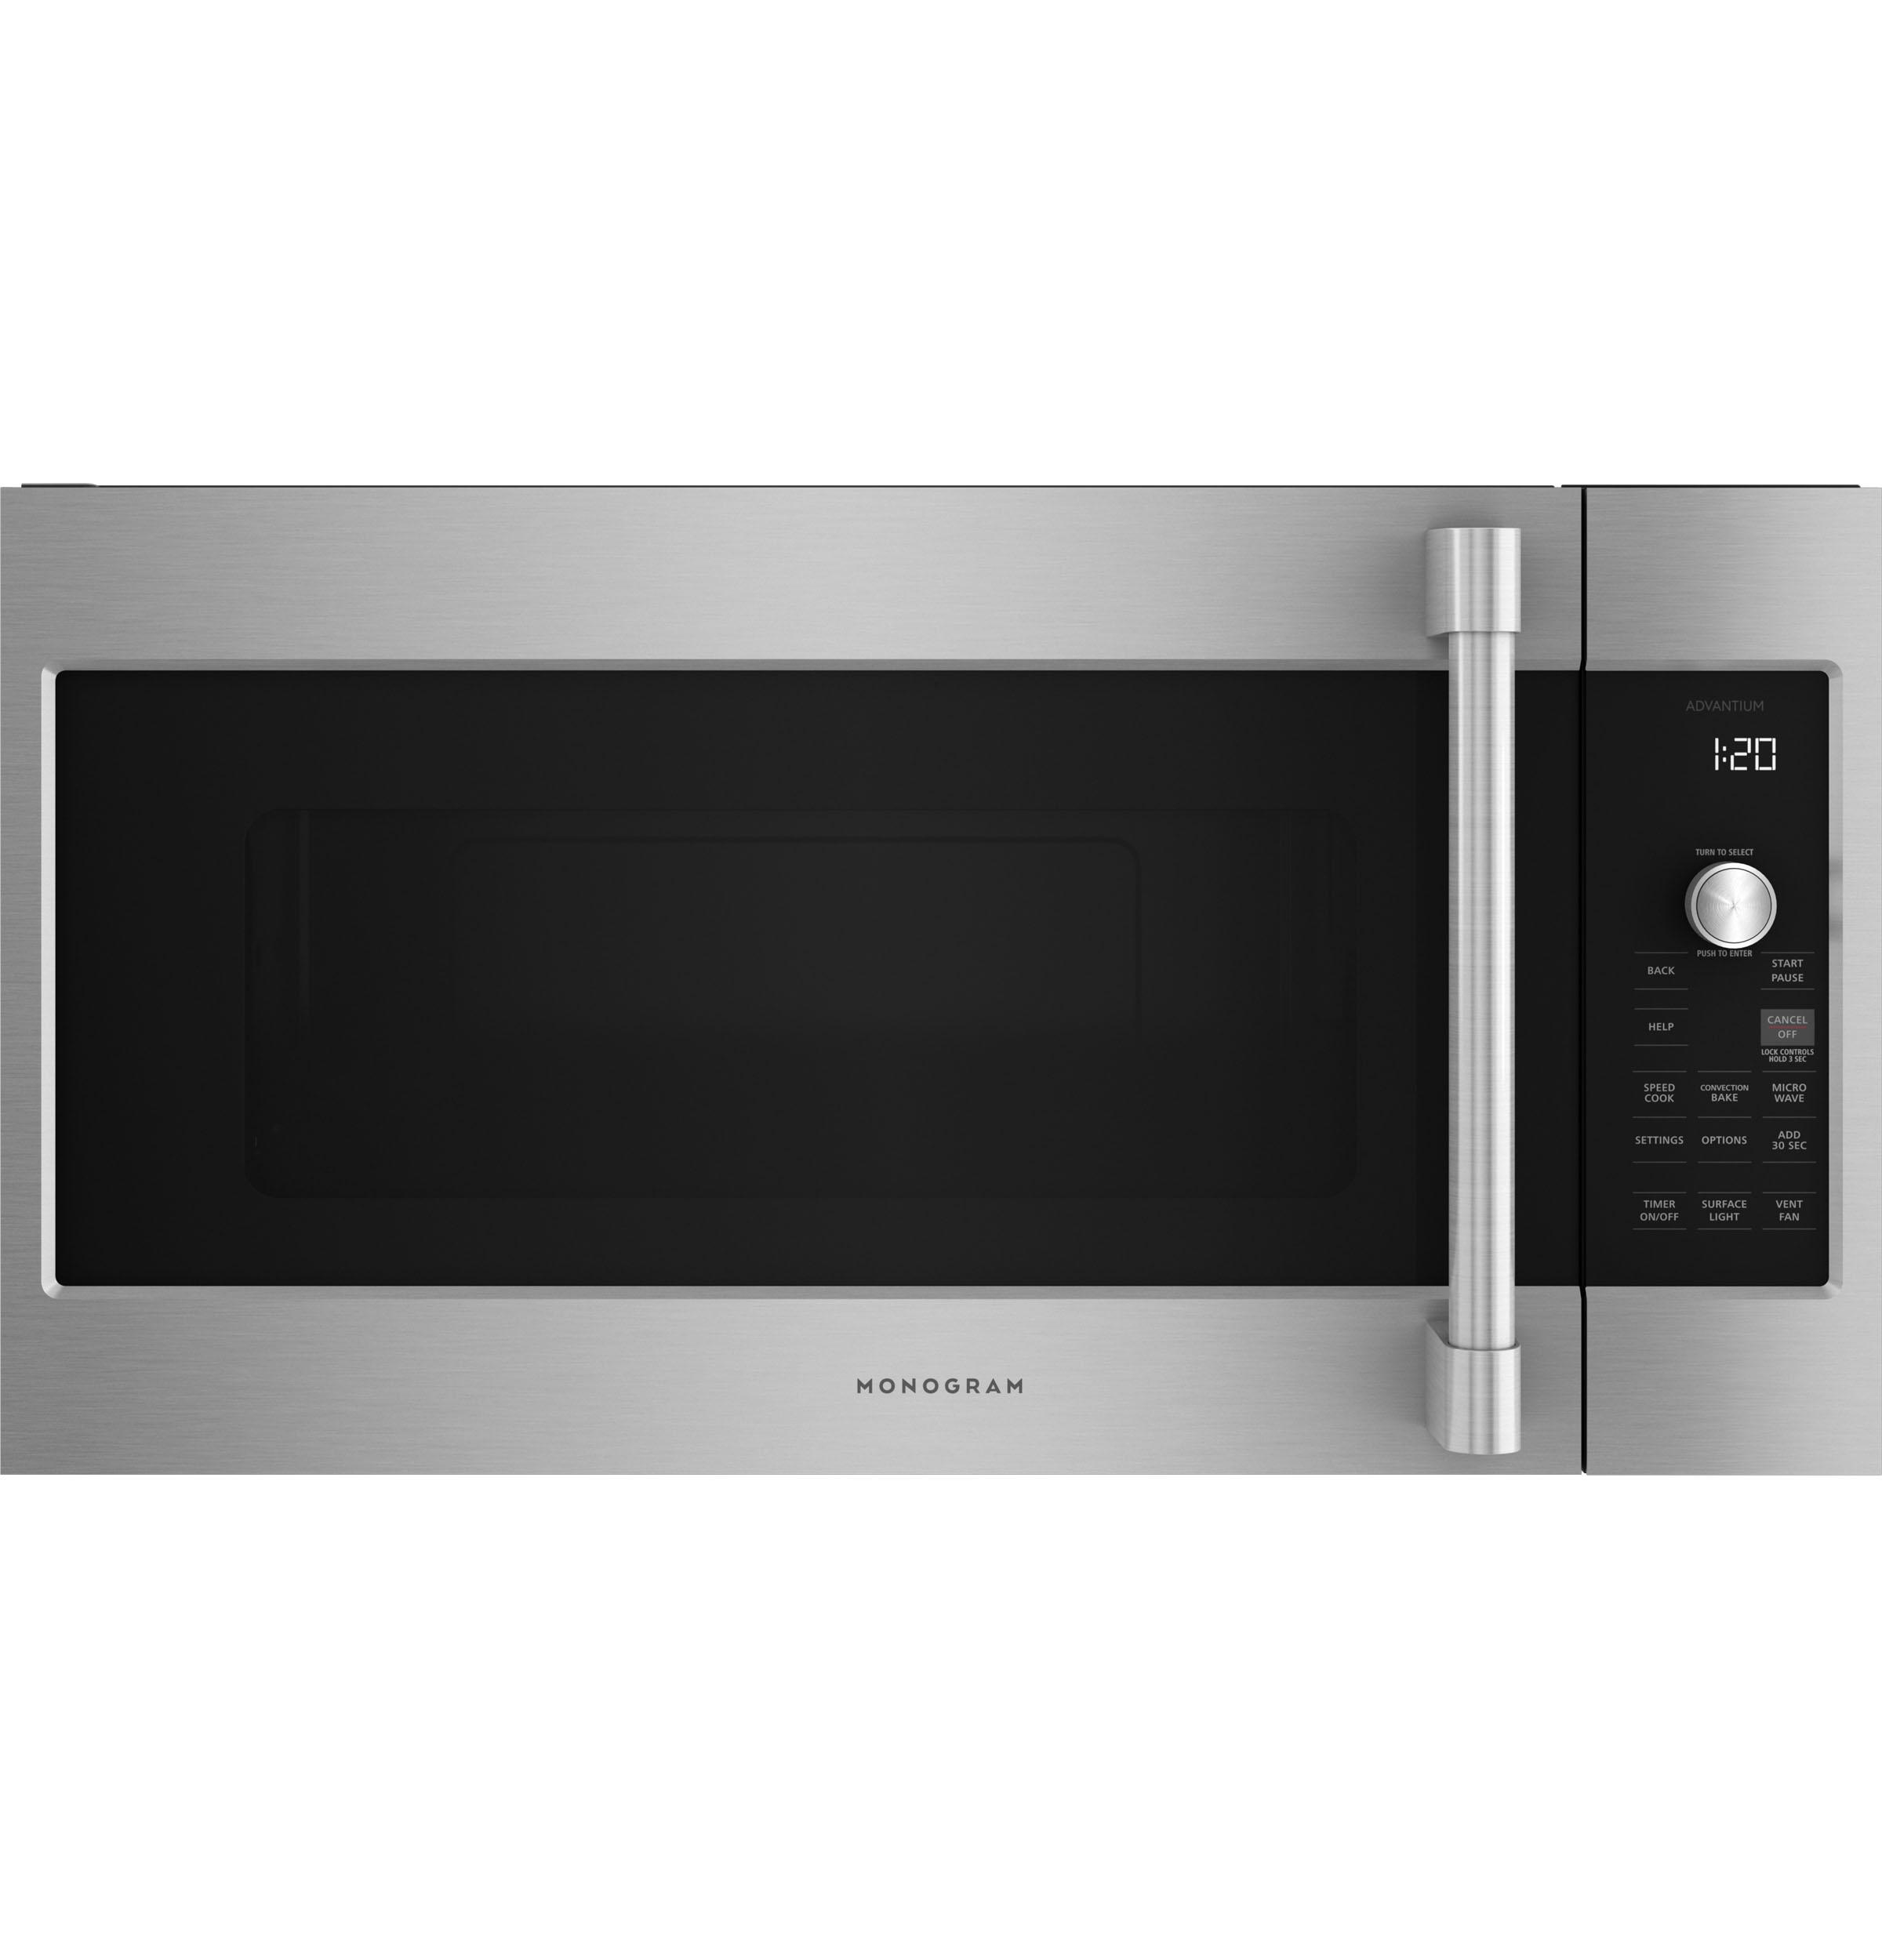 Monogram Monogram Advantium® 120 Above-the-Cooktop Speedcooking Oven